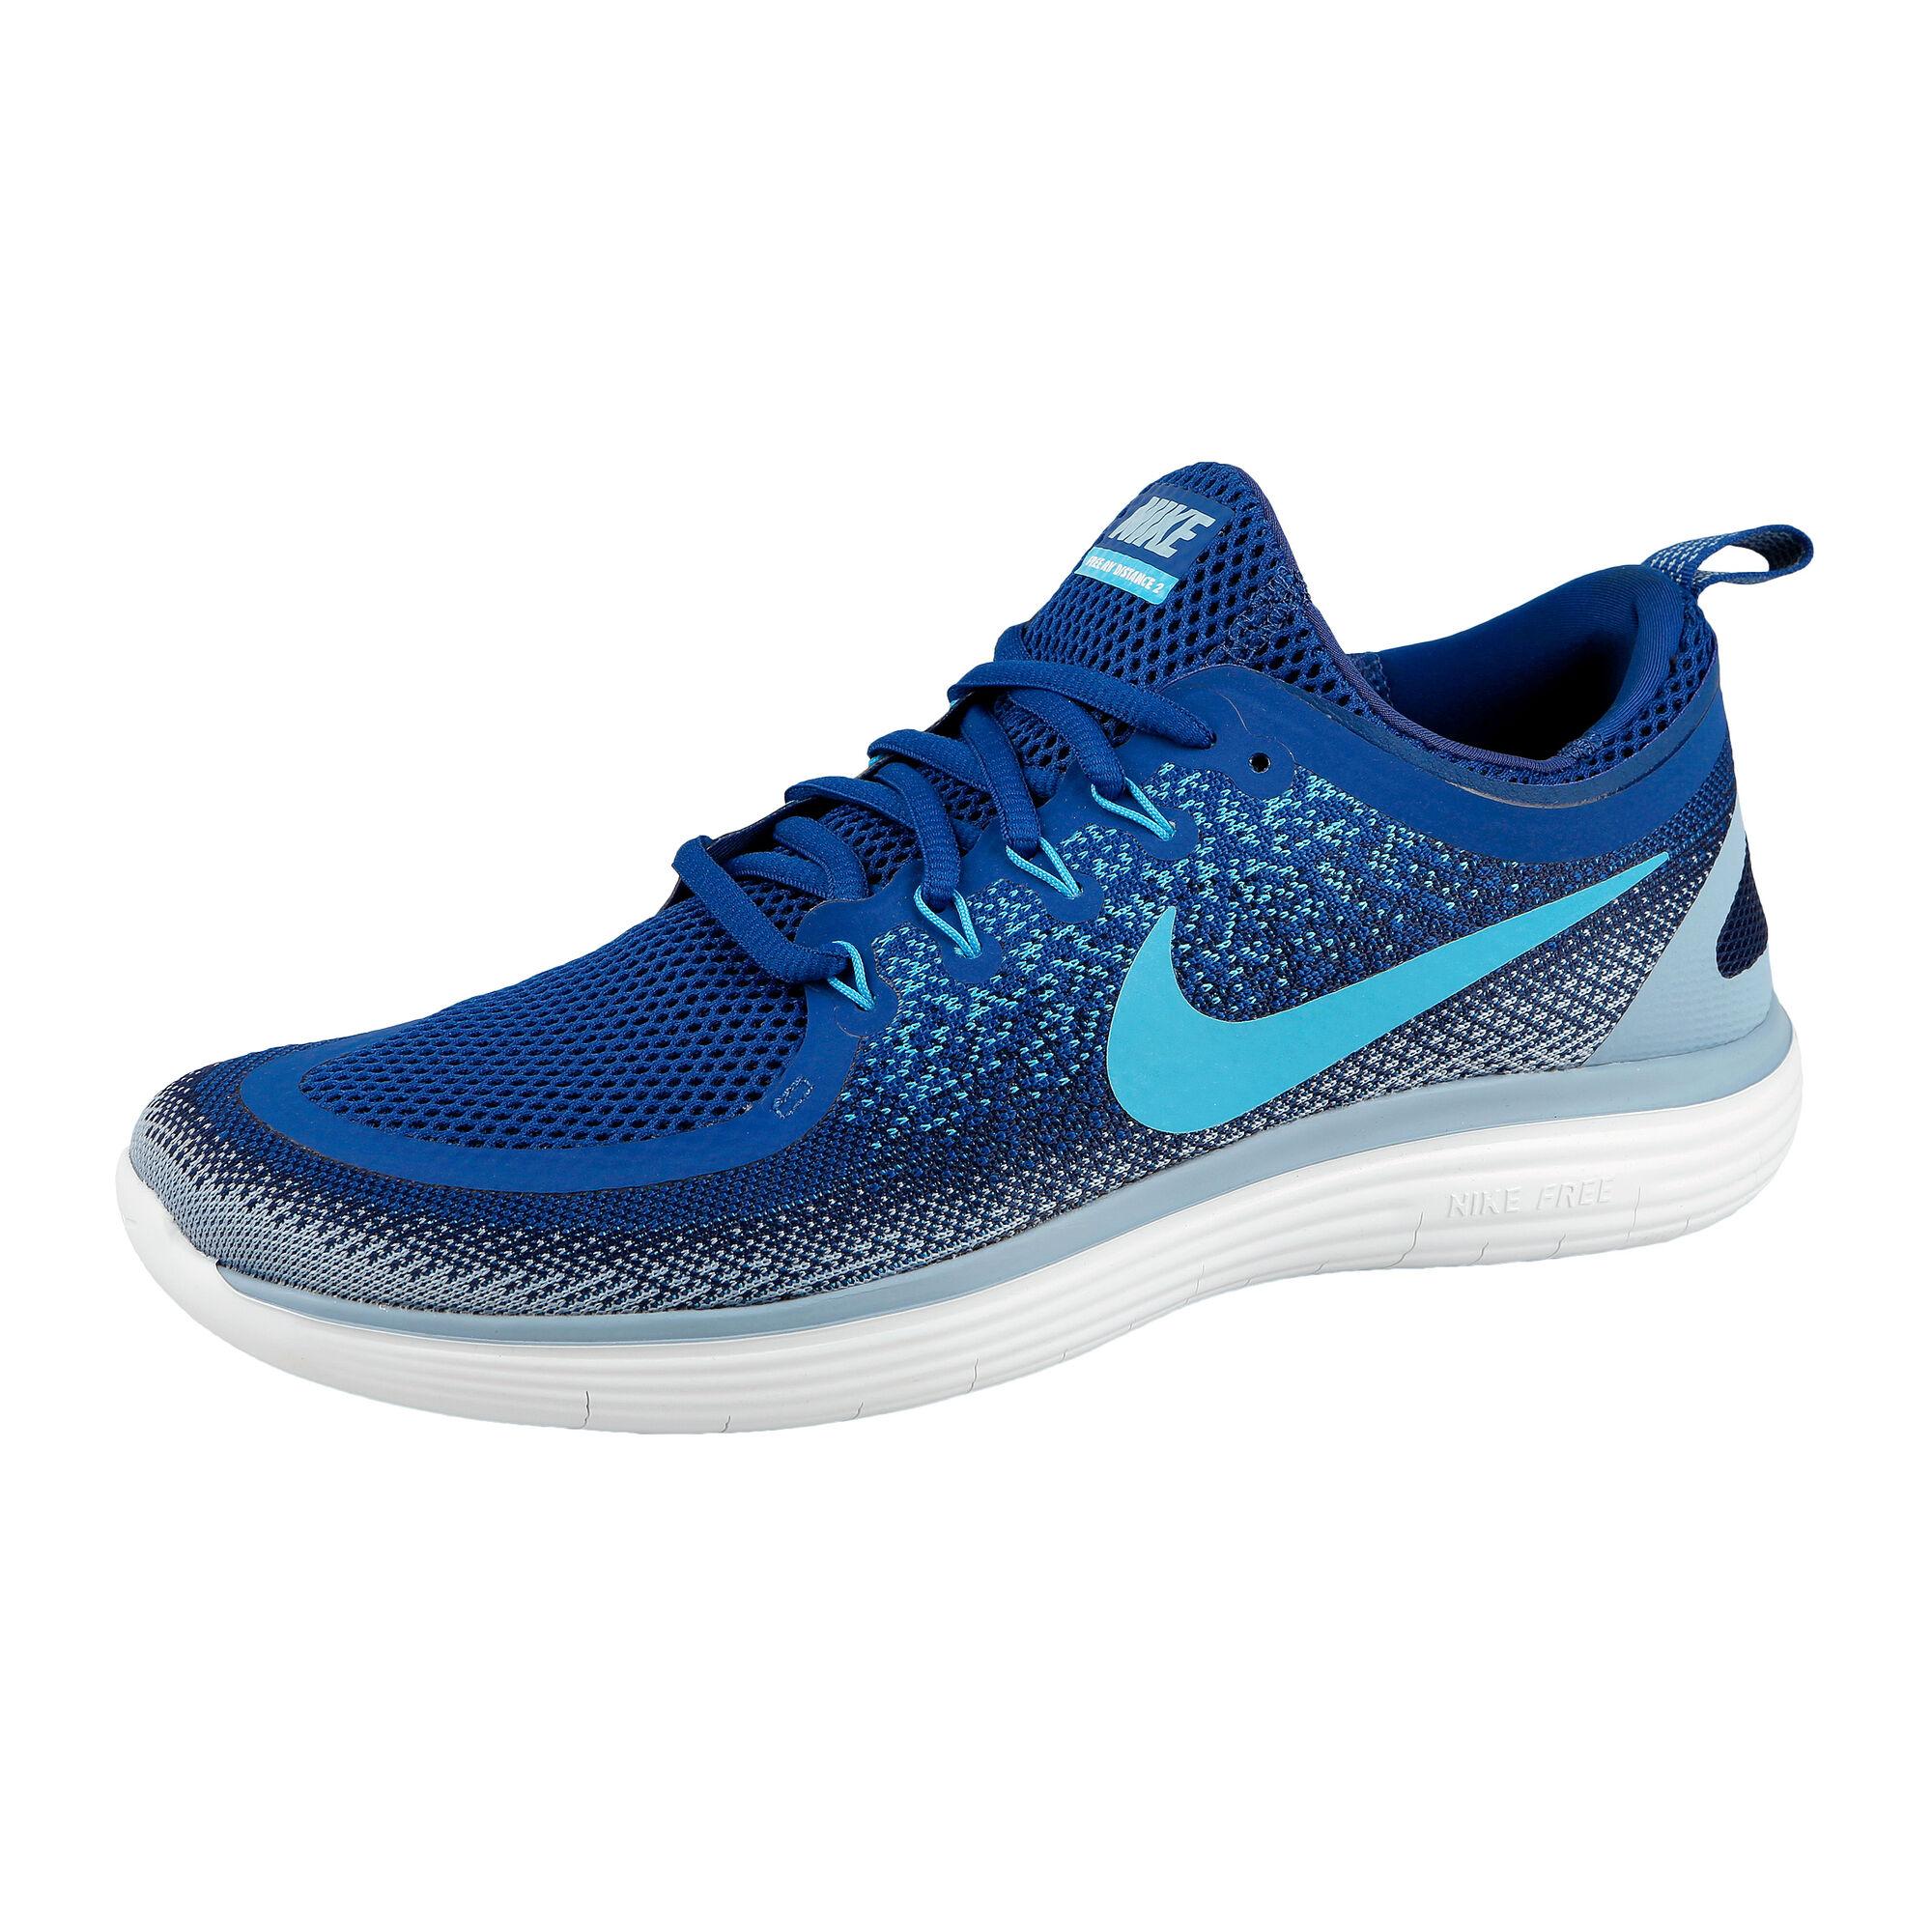 8f10efc2fa82d buy Nike Free Run Distance 2 Natural Running Shoe Men - Blue